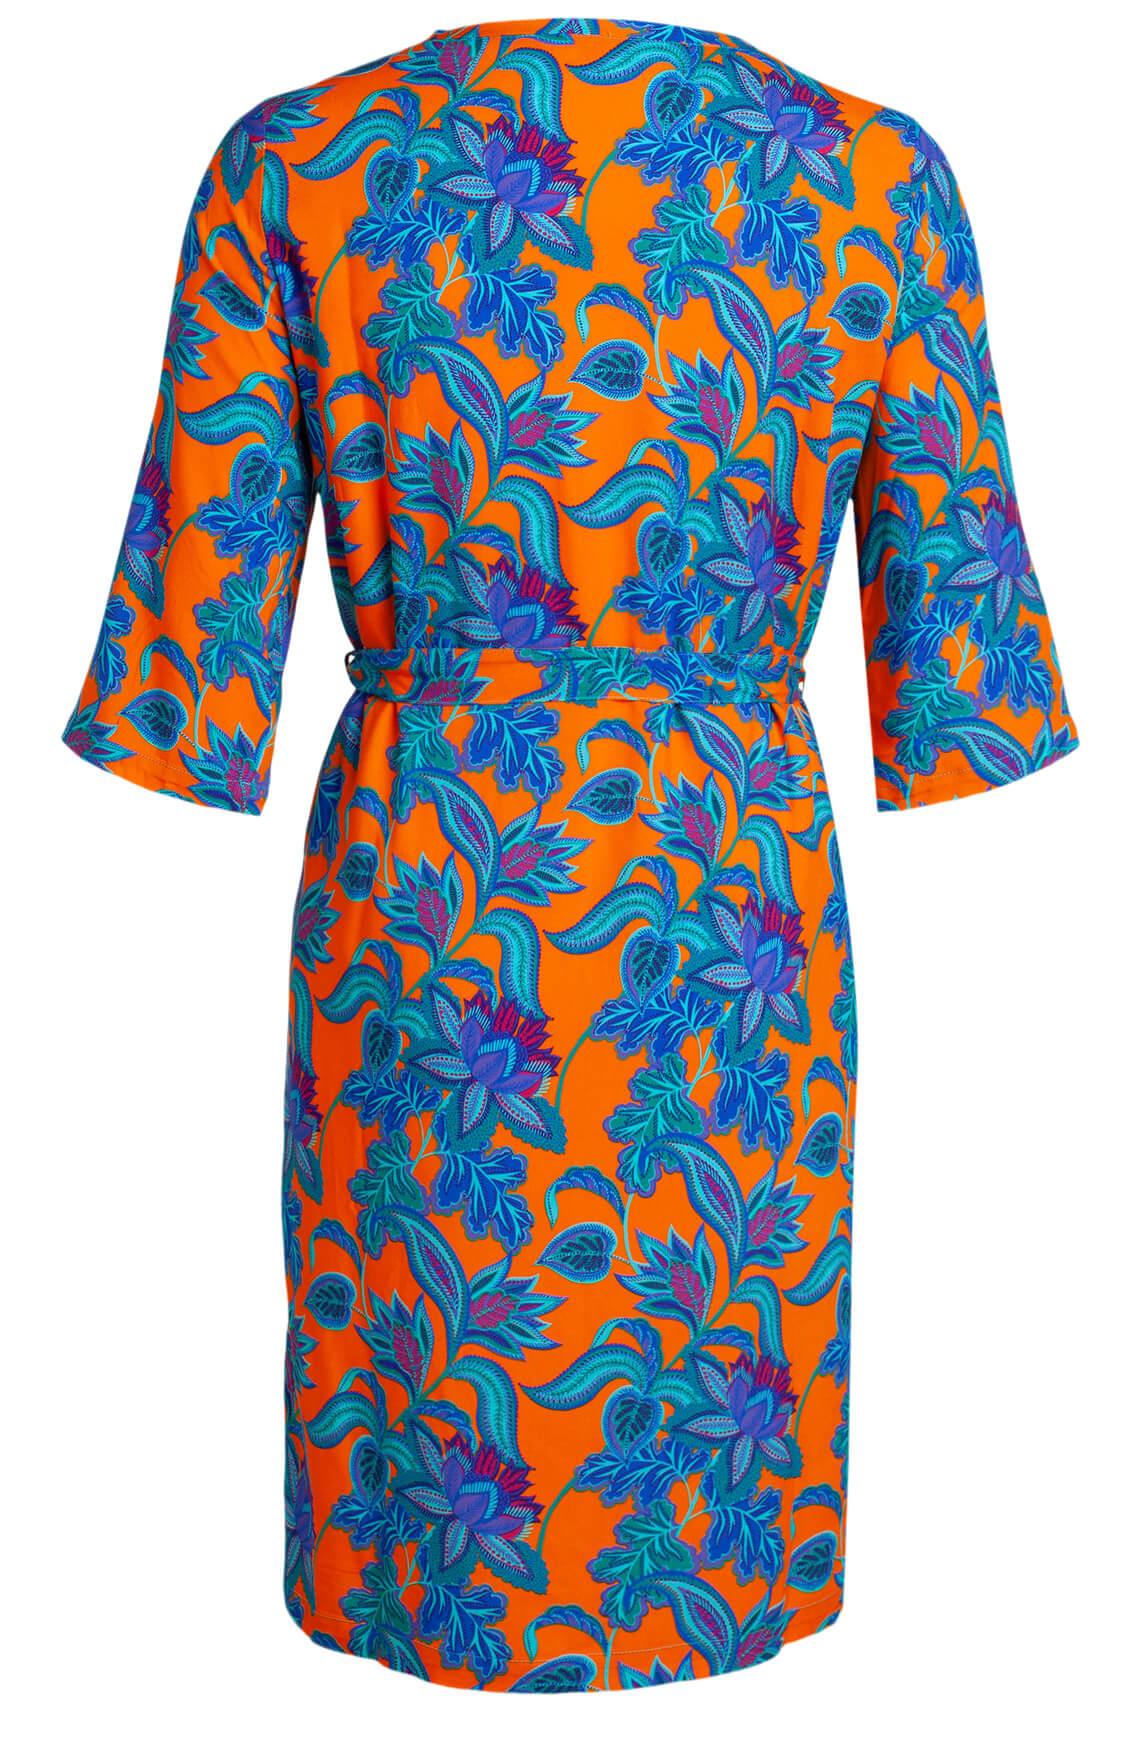 Anna Dames Jurk met bloemenprint Oranje